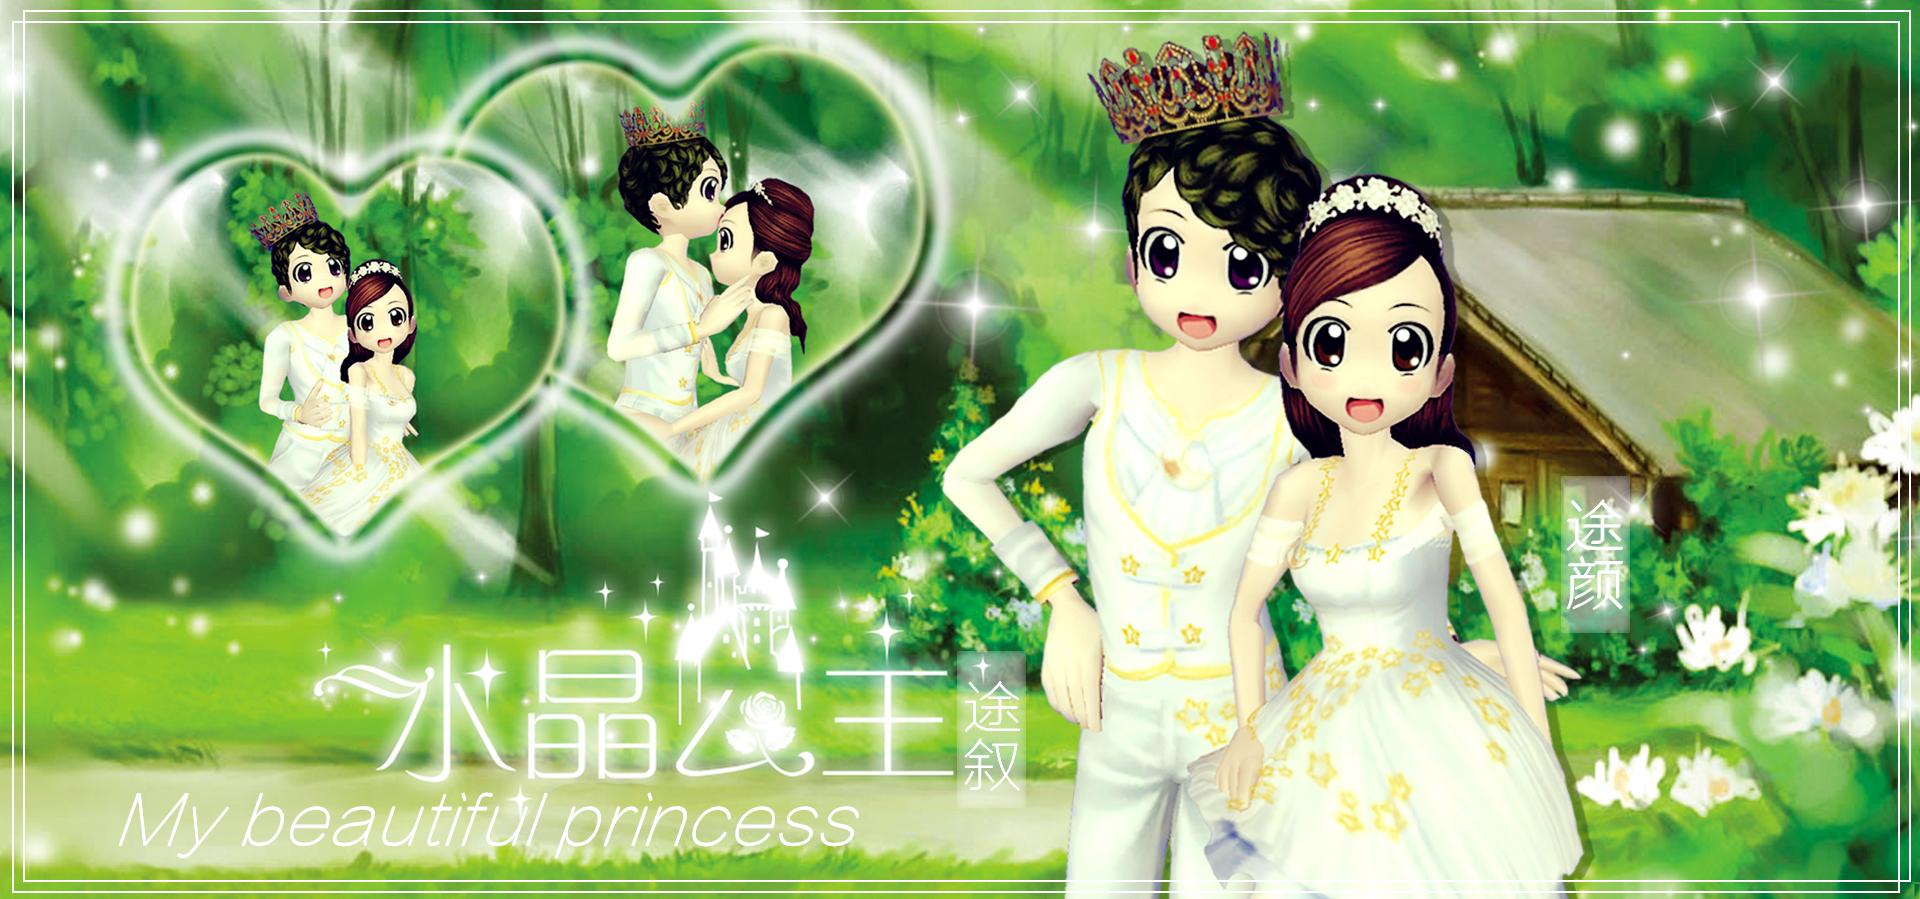 My beautiful princess.jpg